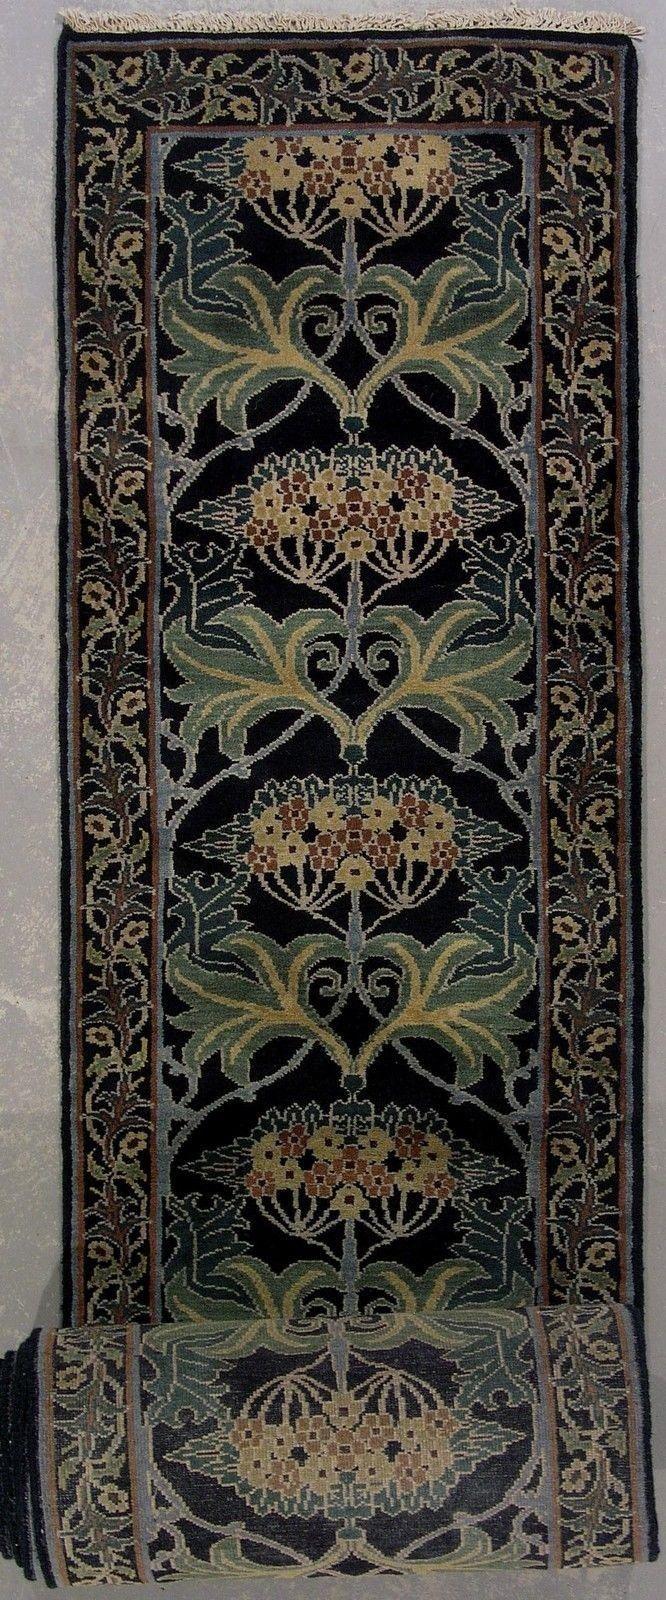 Signed Black 3X35 William Morris Art & Craft Hand Knotted Wool Runner Rug Carpet | eBay